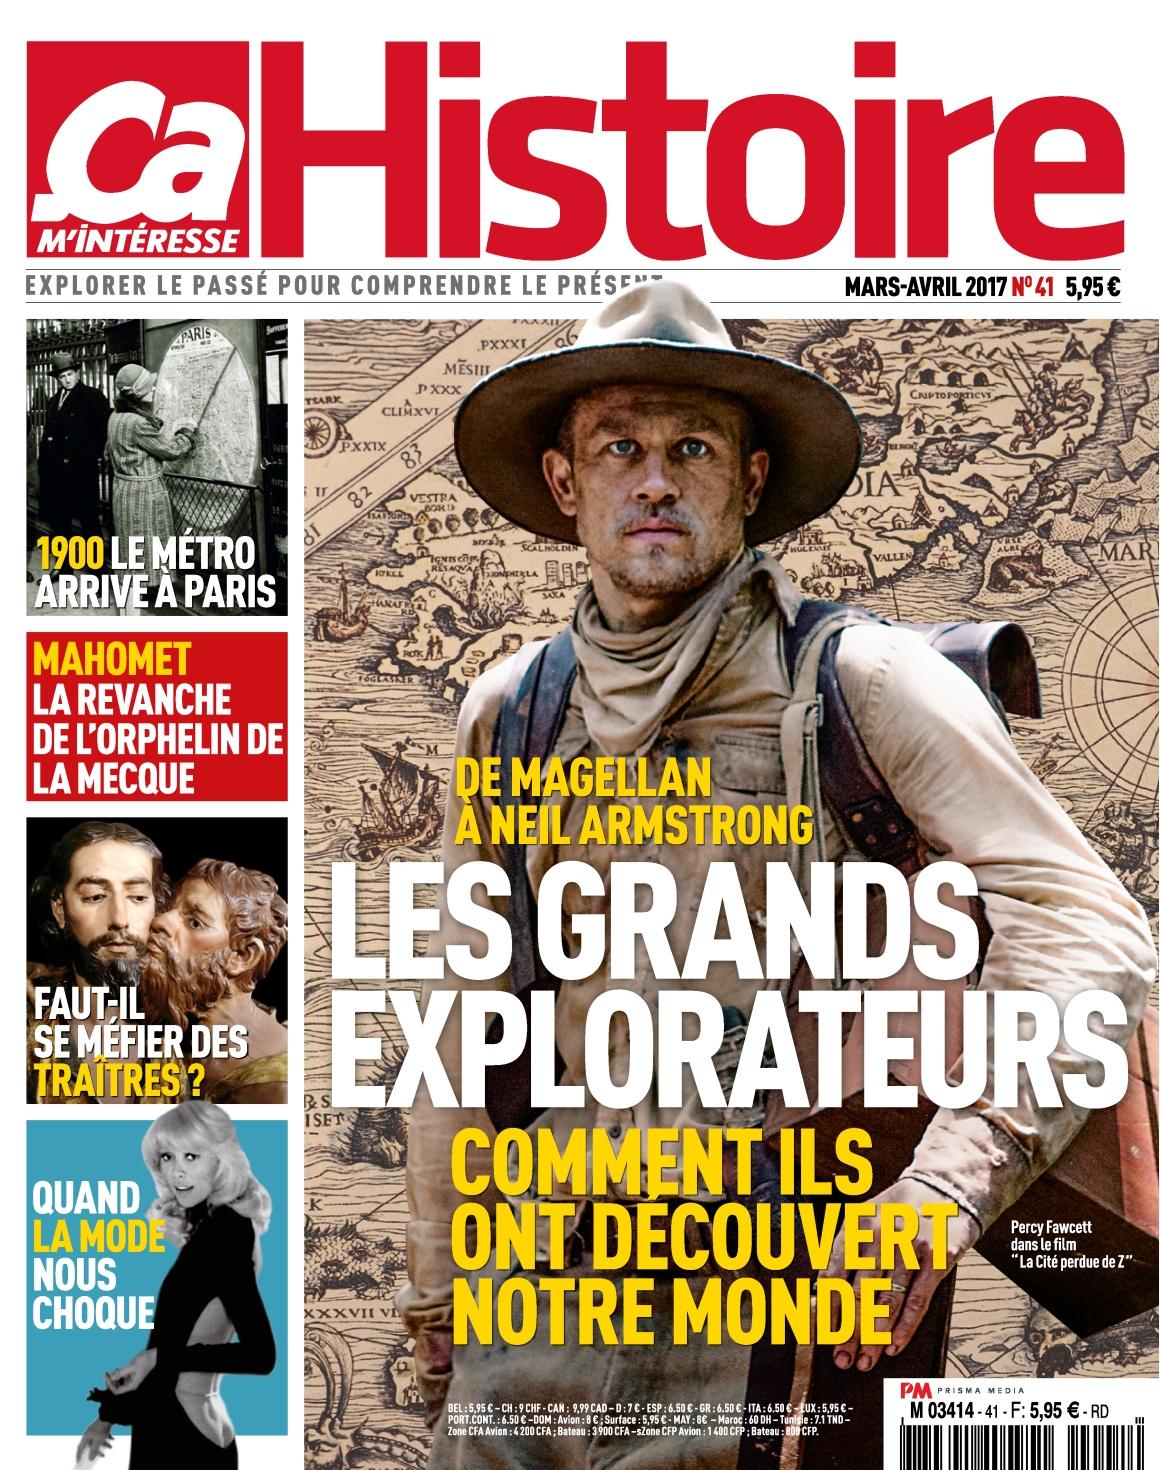 Ça M'Intéresse Histoire N°41 - Mars/Avril 2017